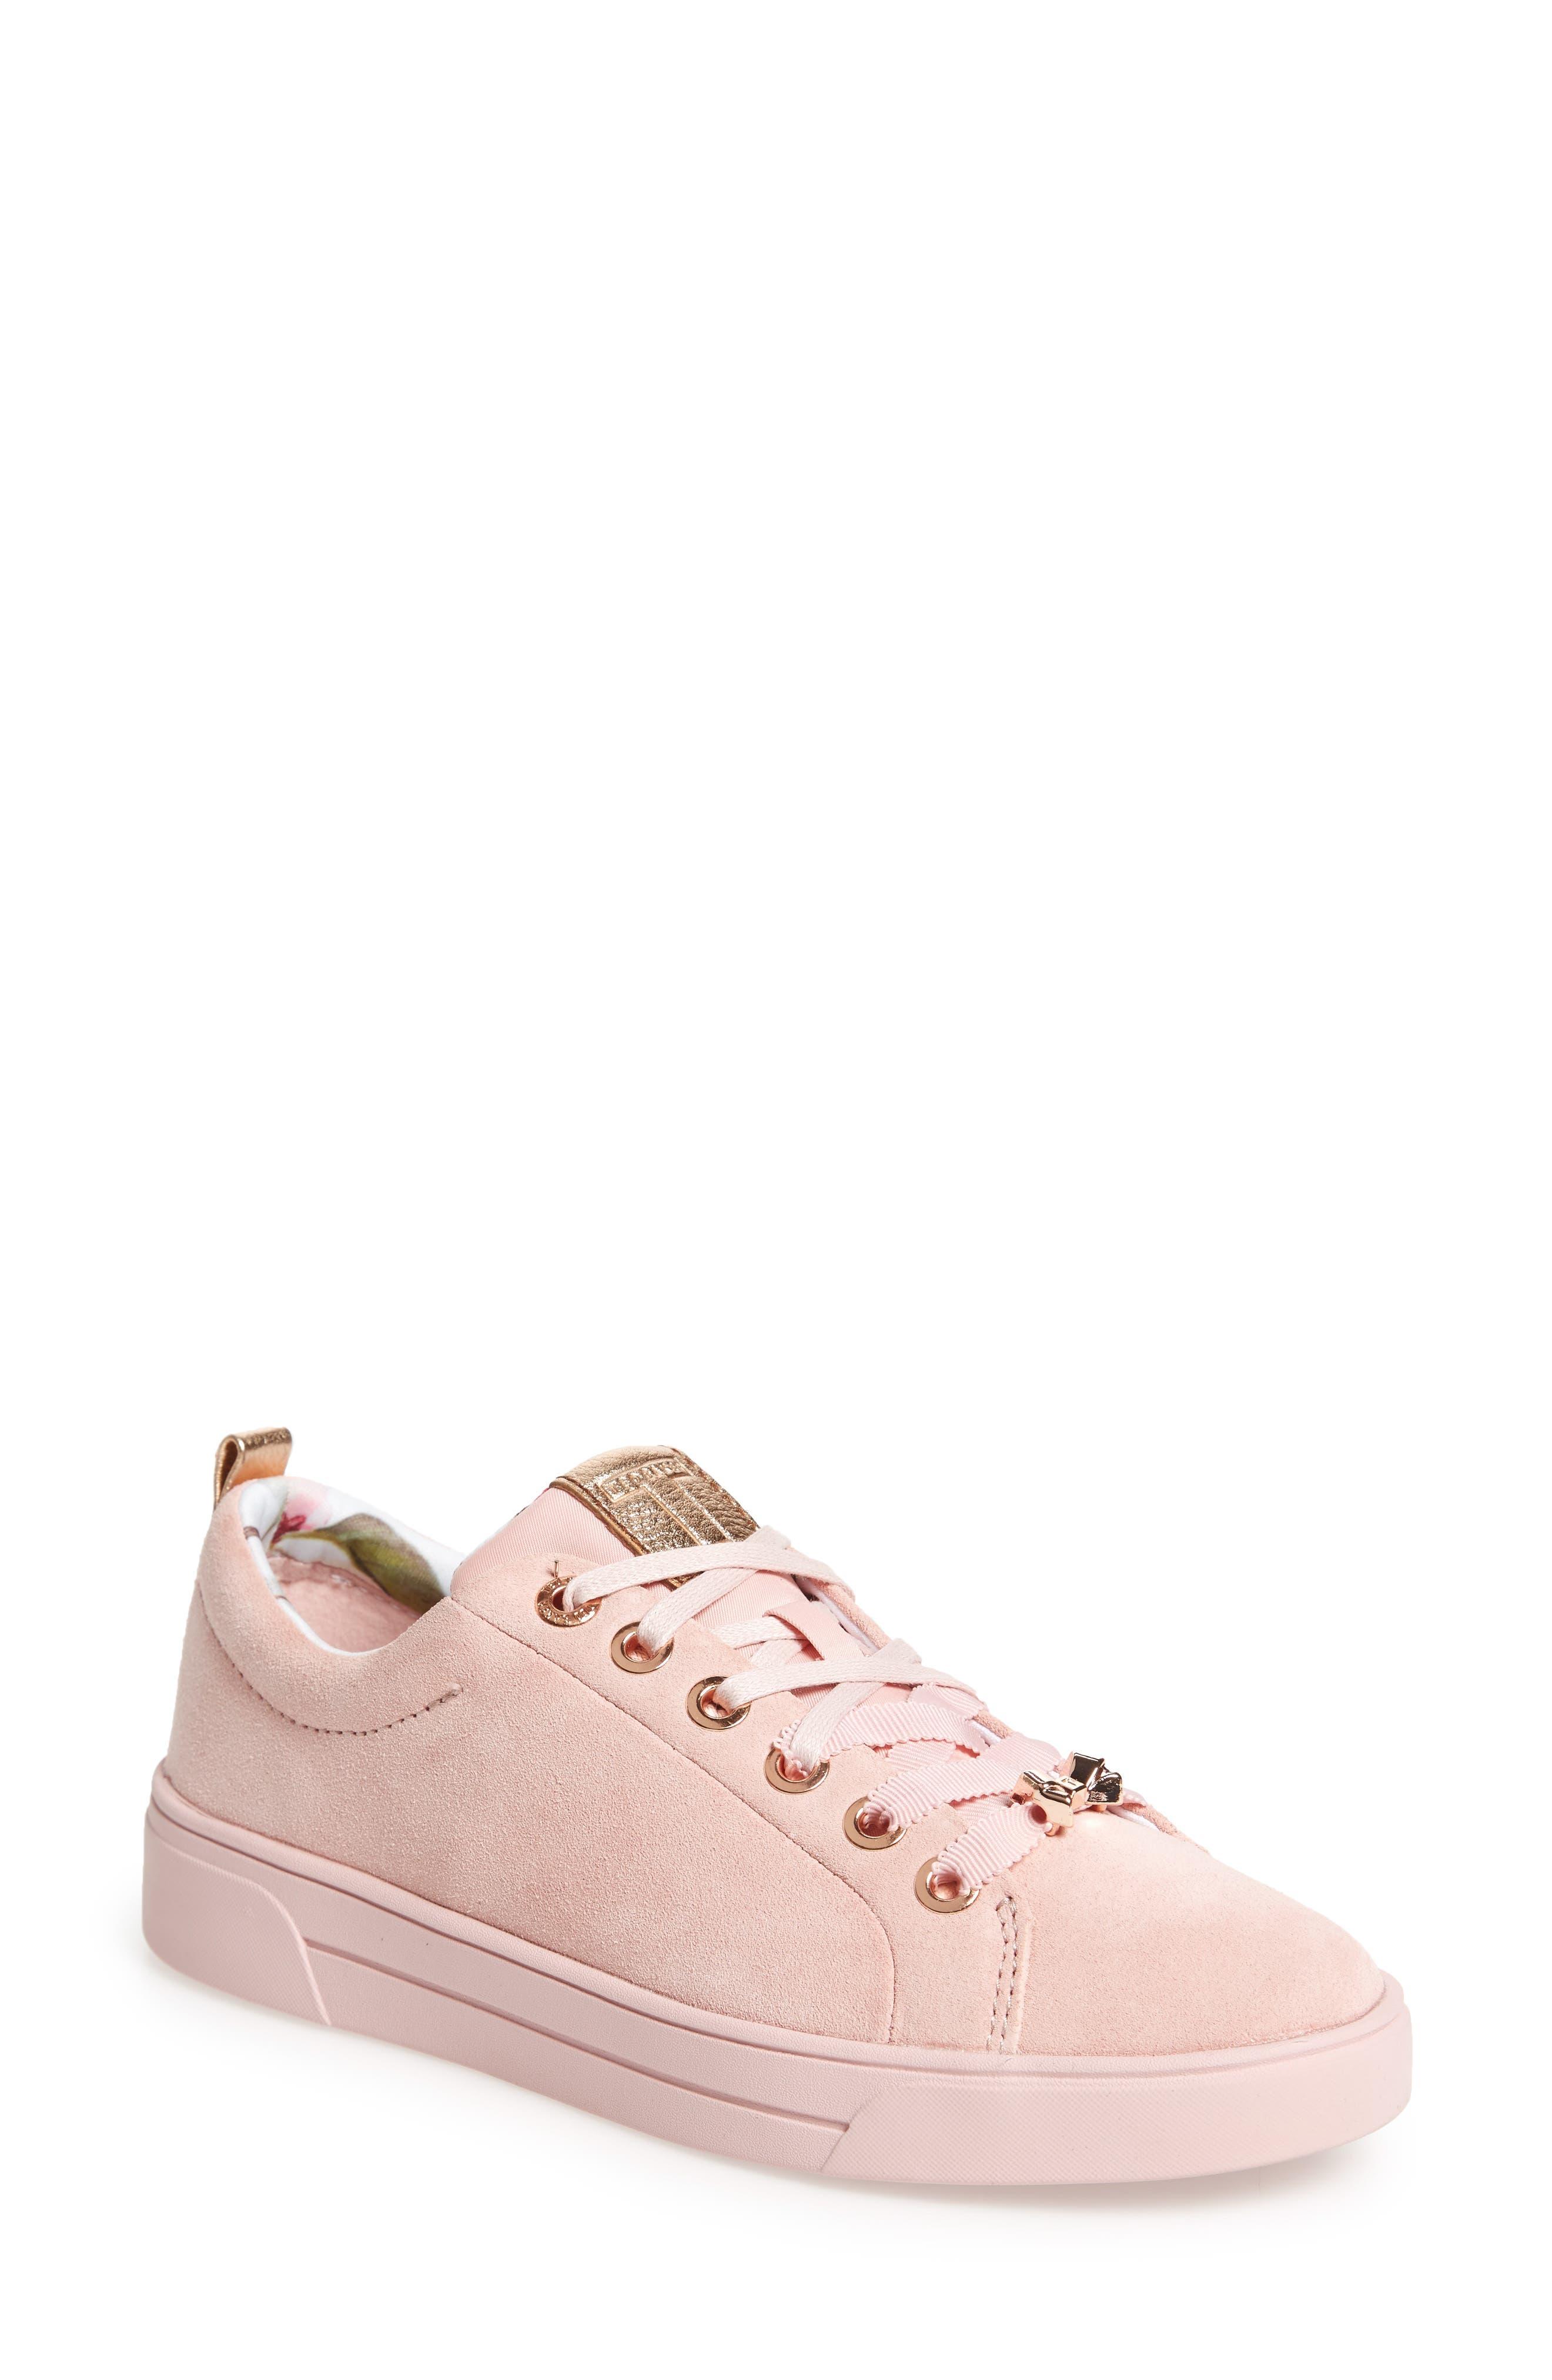 Kelleip Sneaker,                             Main thumbnail 1, color,                             Mink Pink Suede